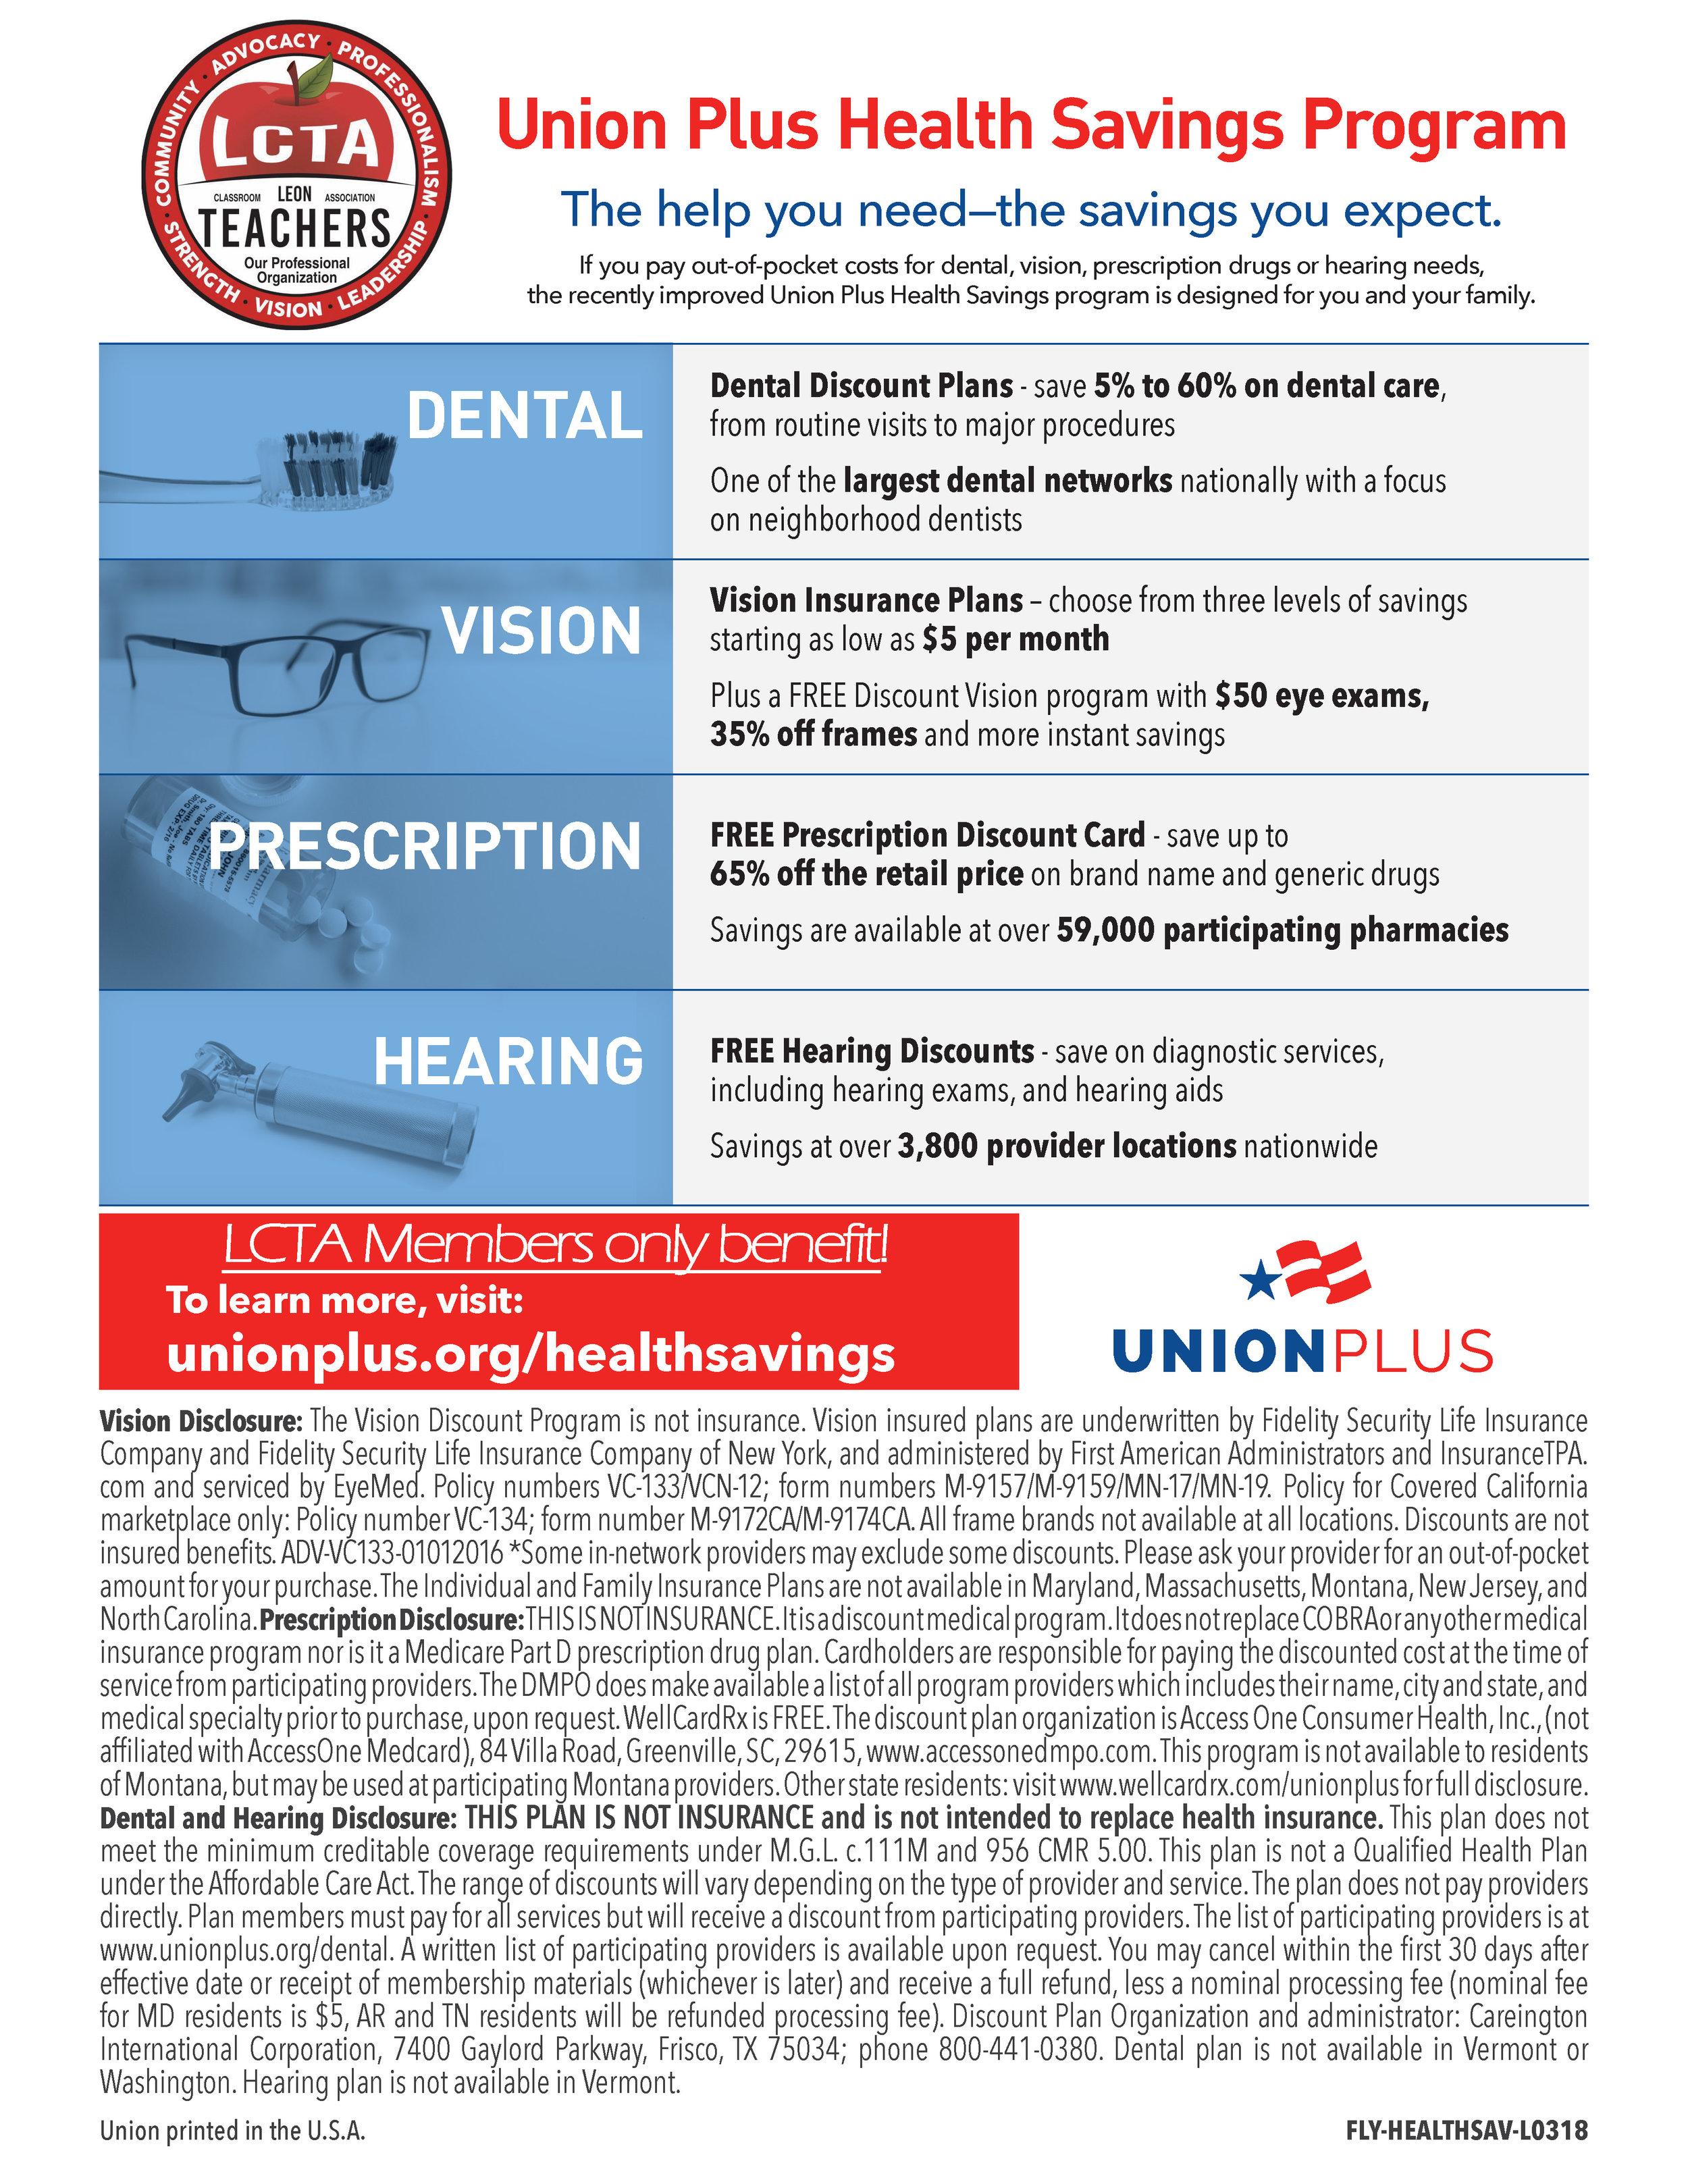 Union Plus Savings! - Visit unionplus.org/healthsavings.